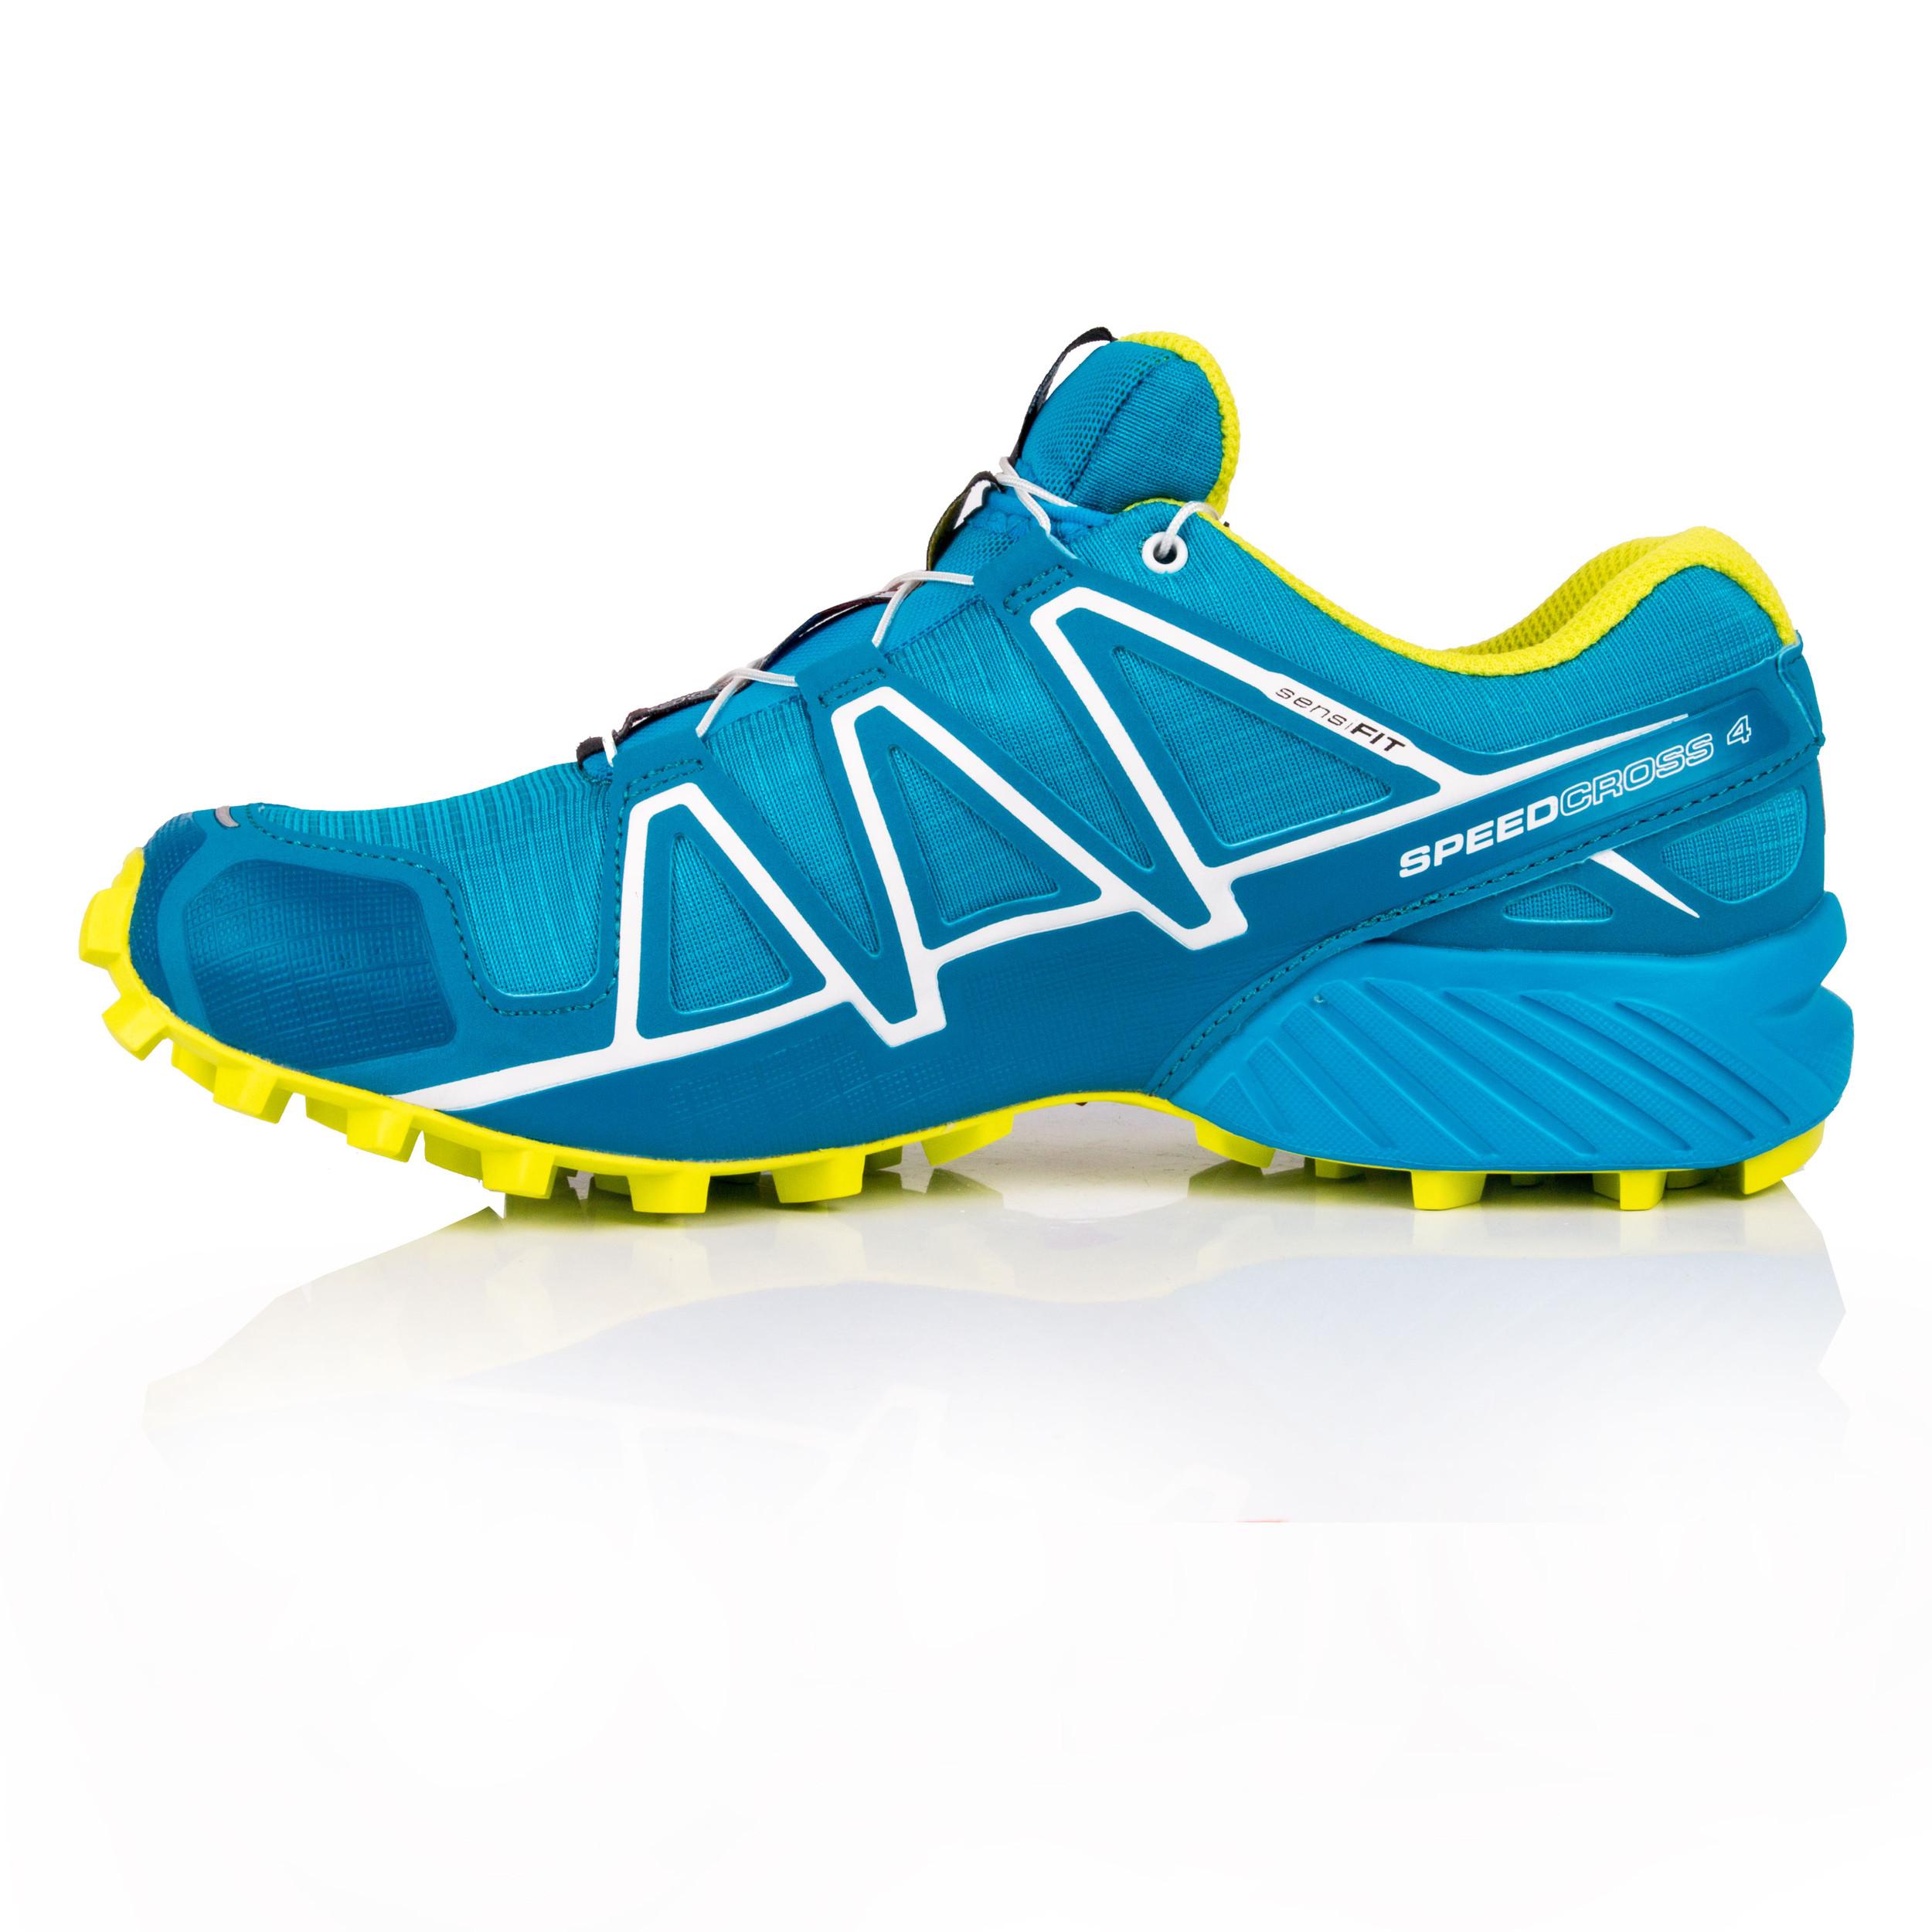 SALOMON UOMO SPEEDCROSS 4 Trail Scarpe Da Corsa Ginnastica Sport Sneakers Blu